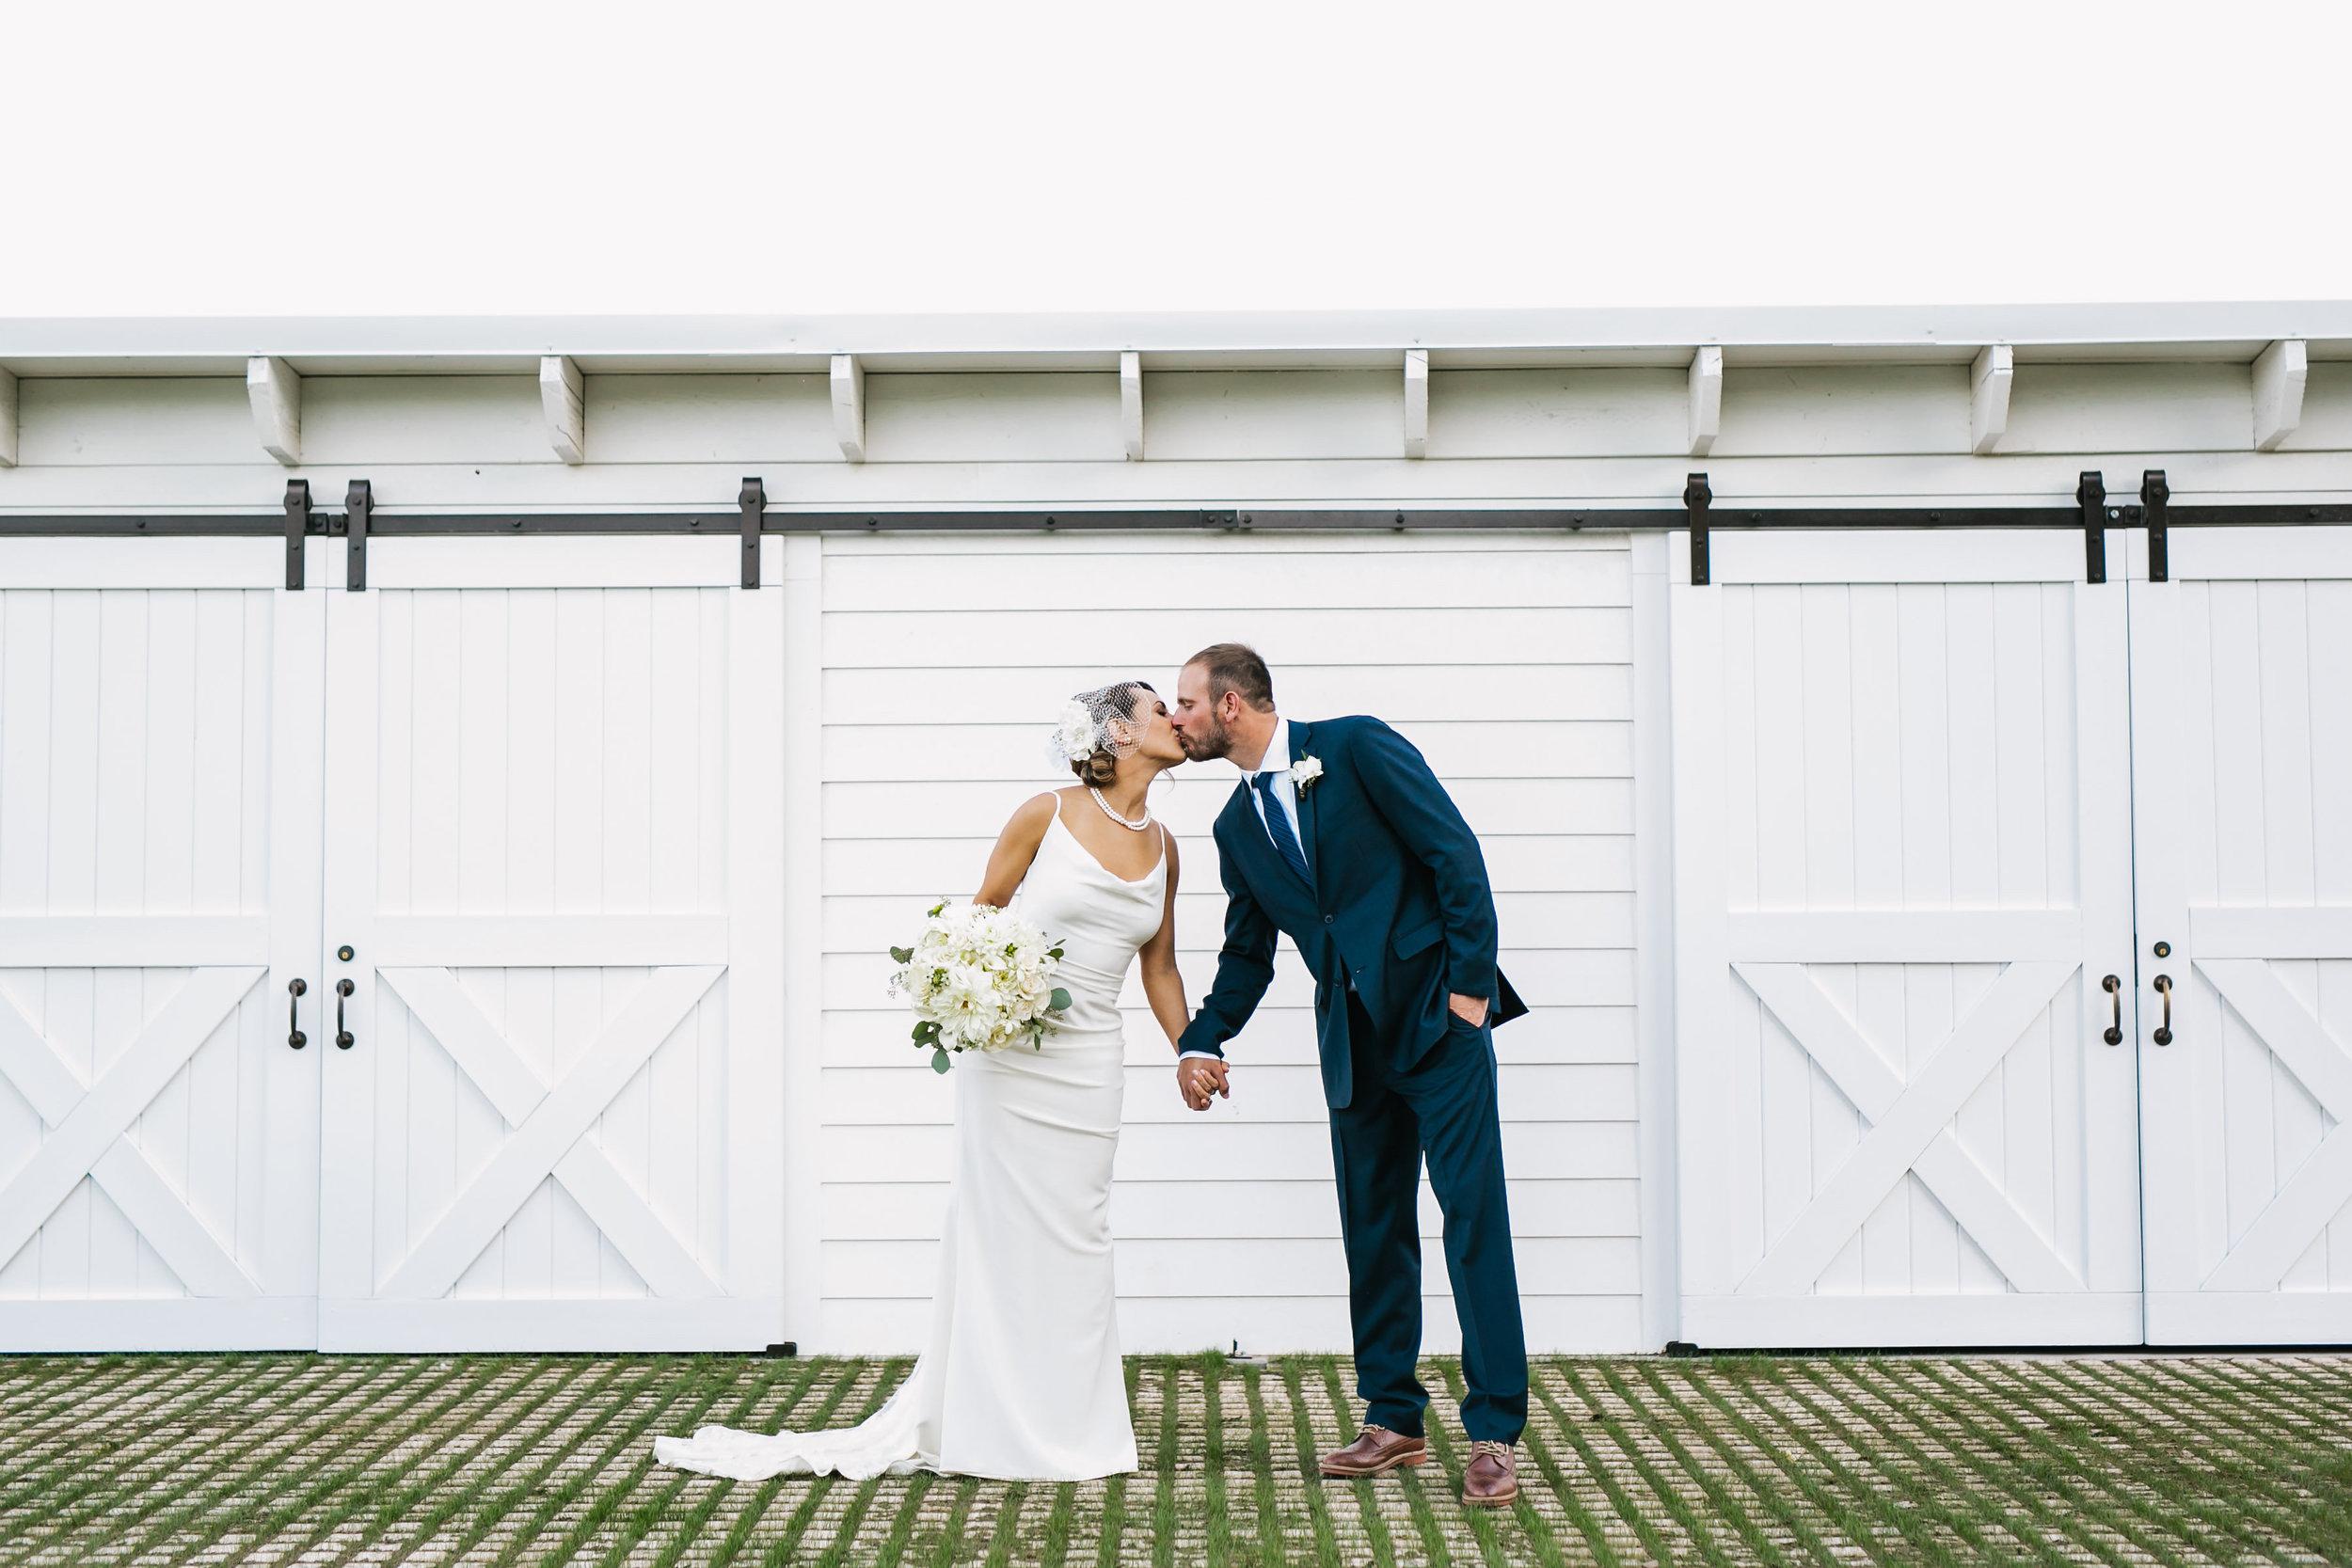 janet_greg_wedding-930.jpg